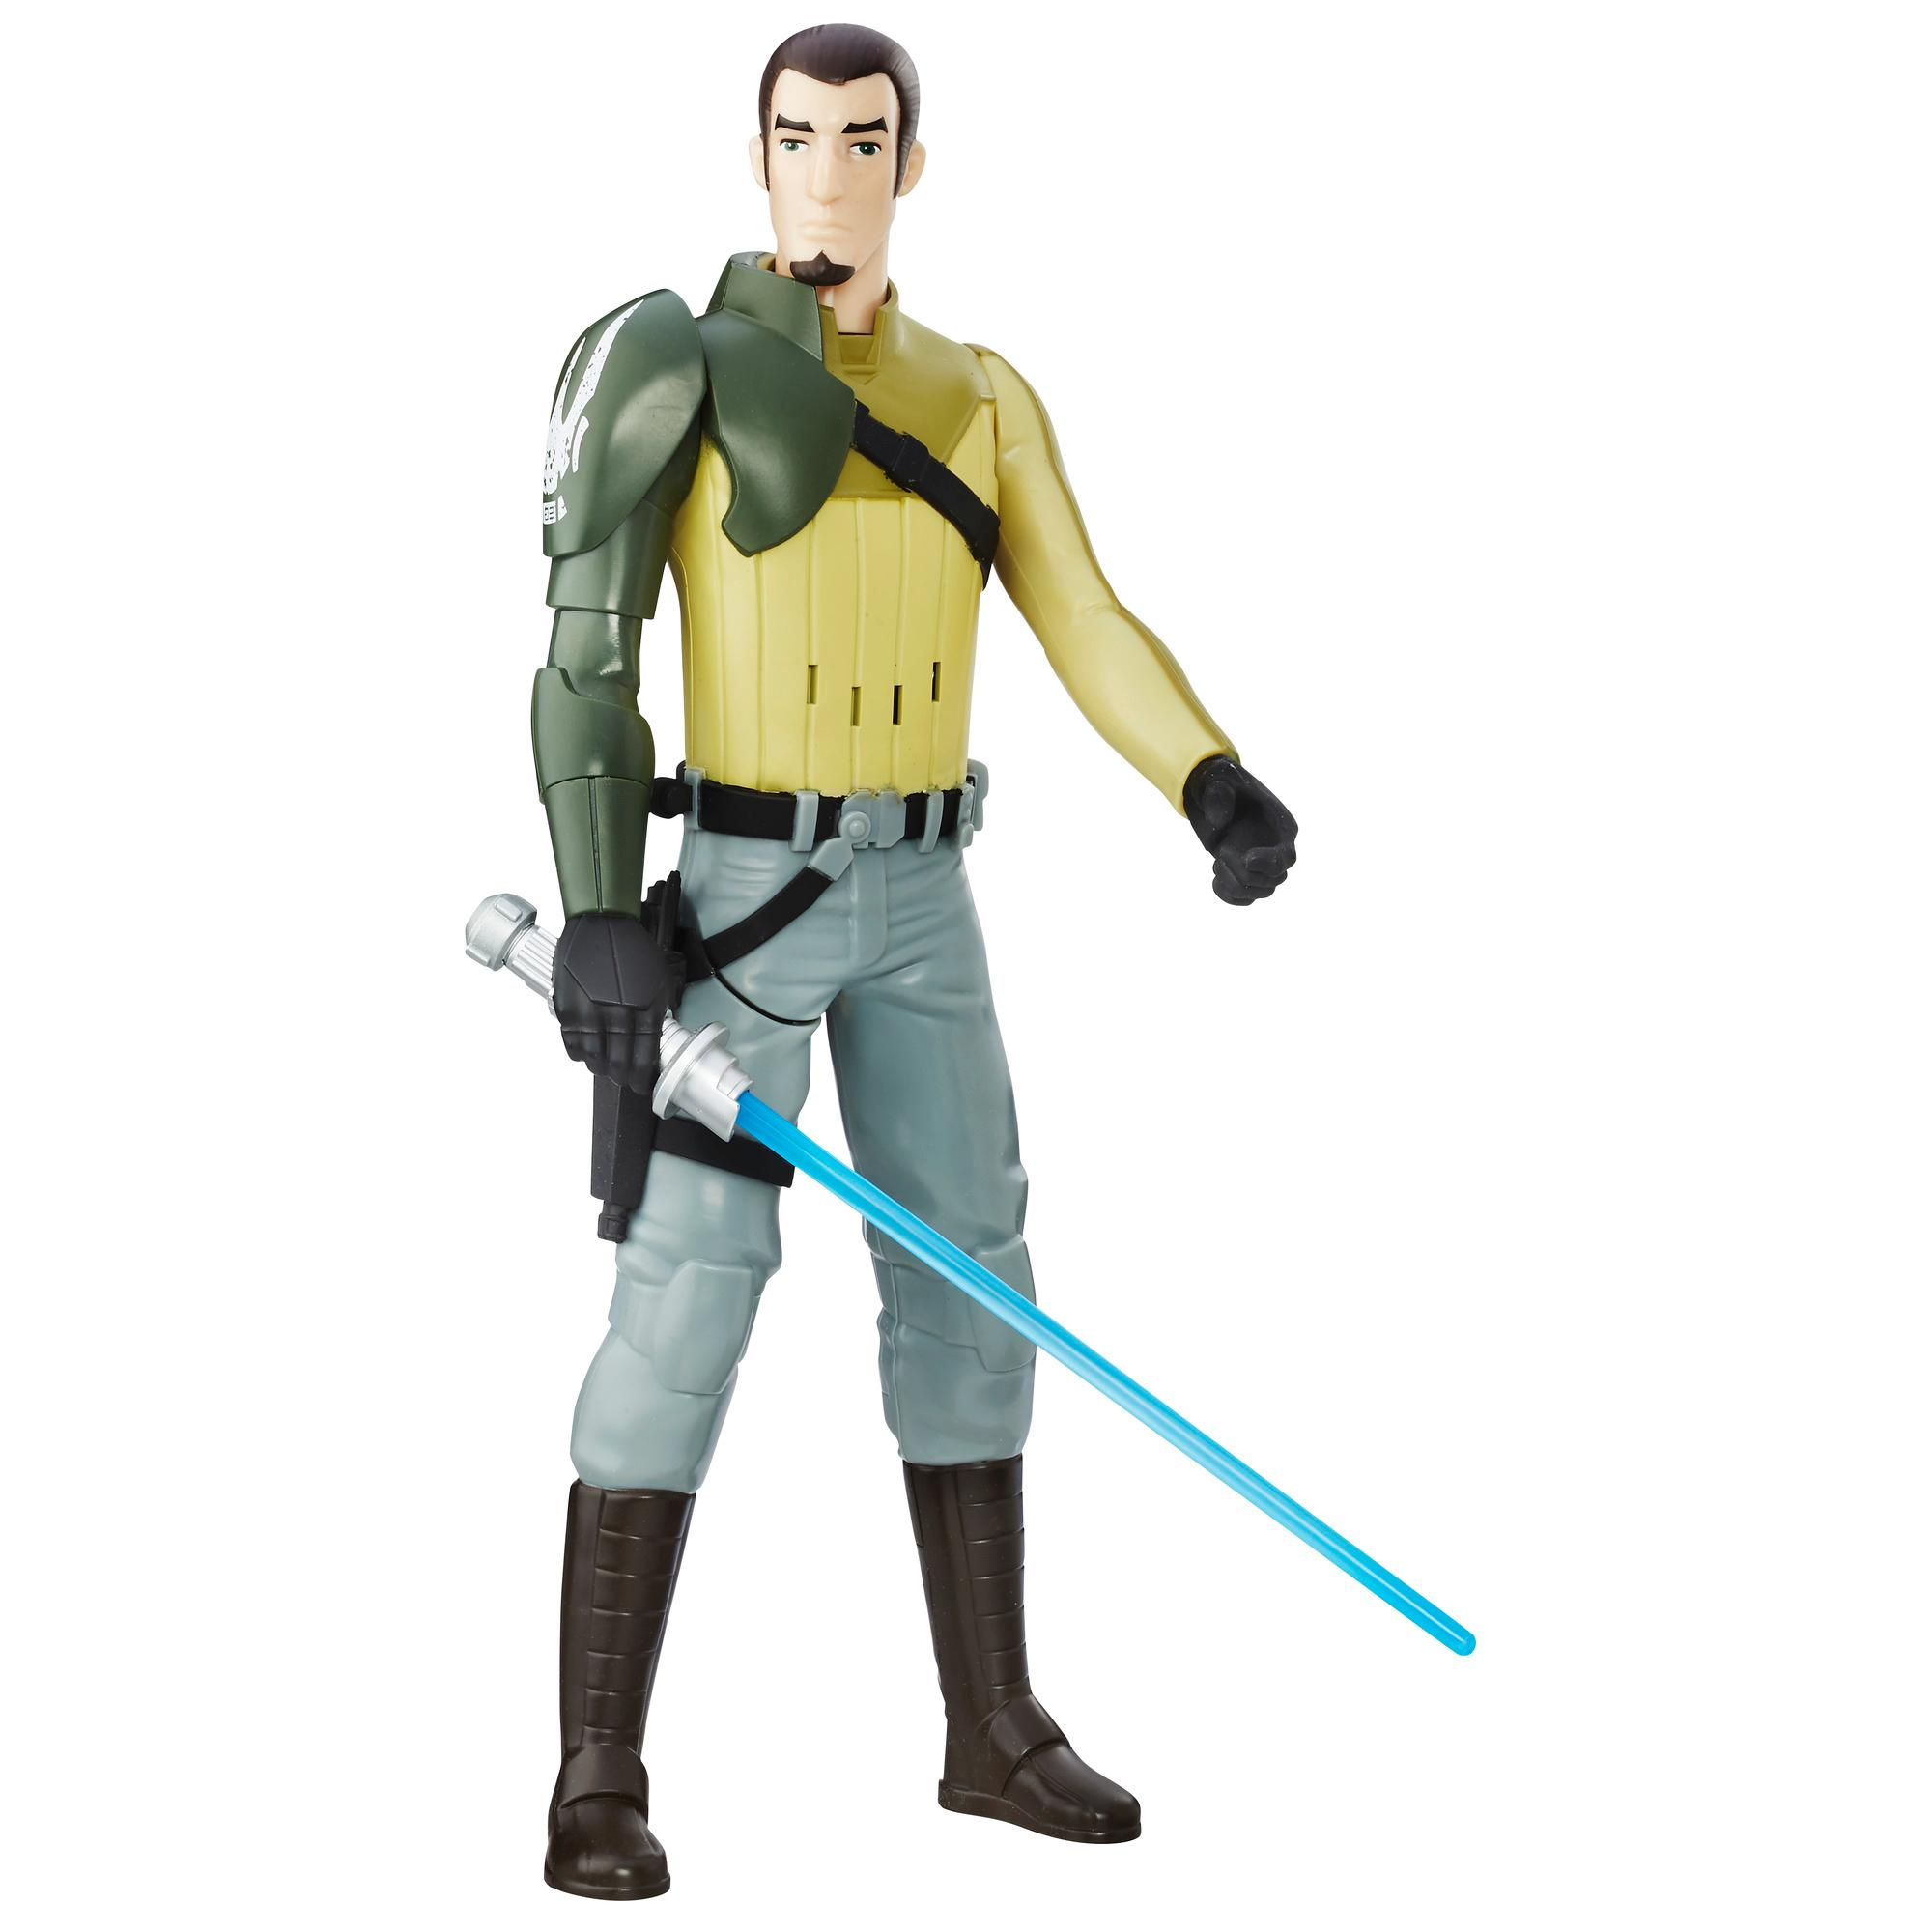 Star Wars Rebels - Duelo Eletrônico Kanan Jarrus